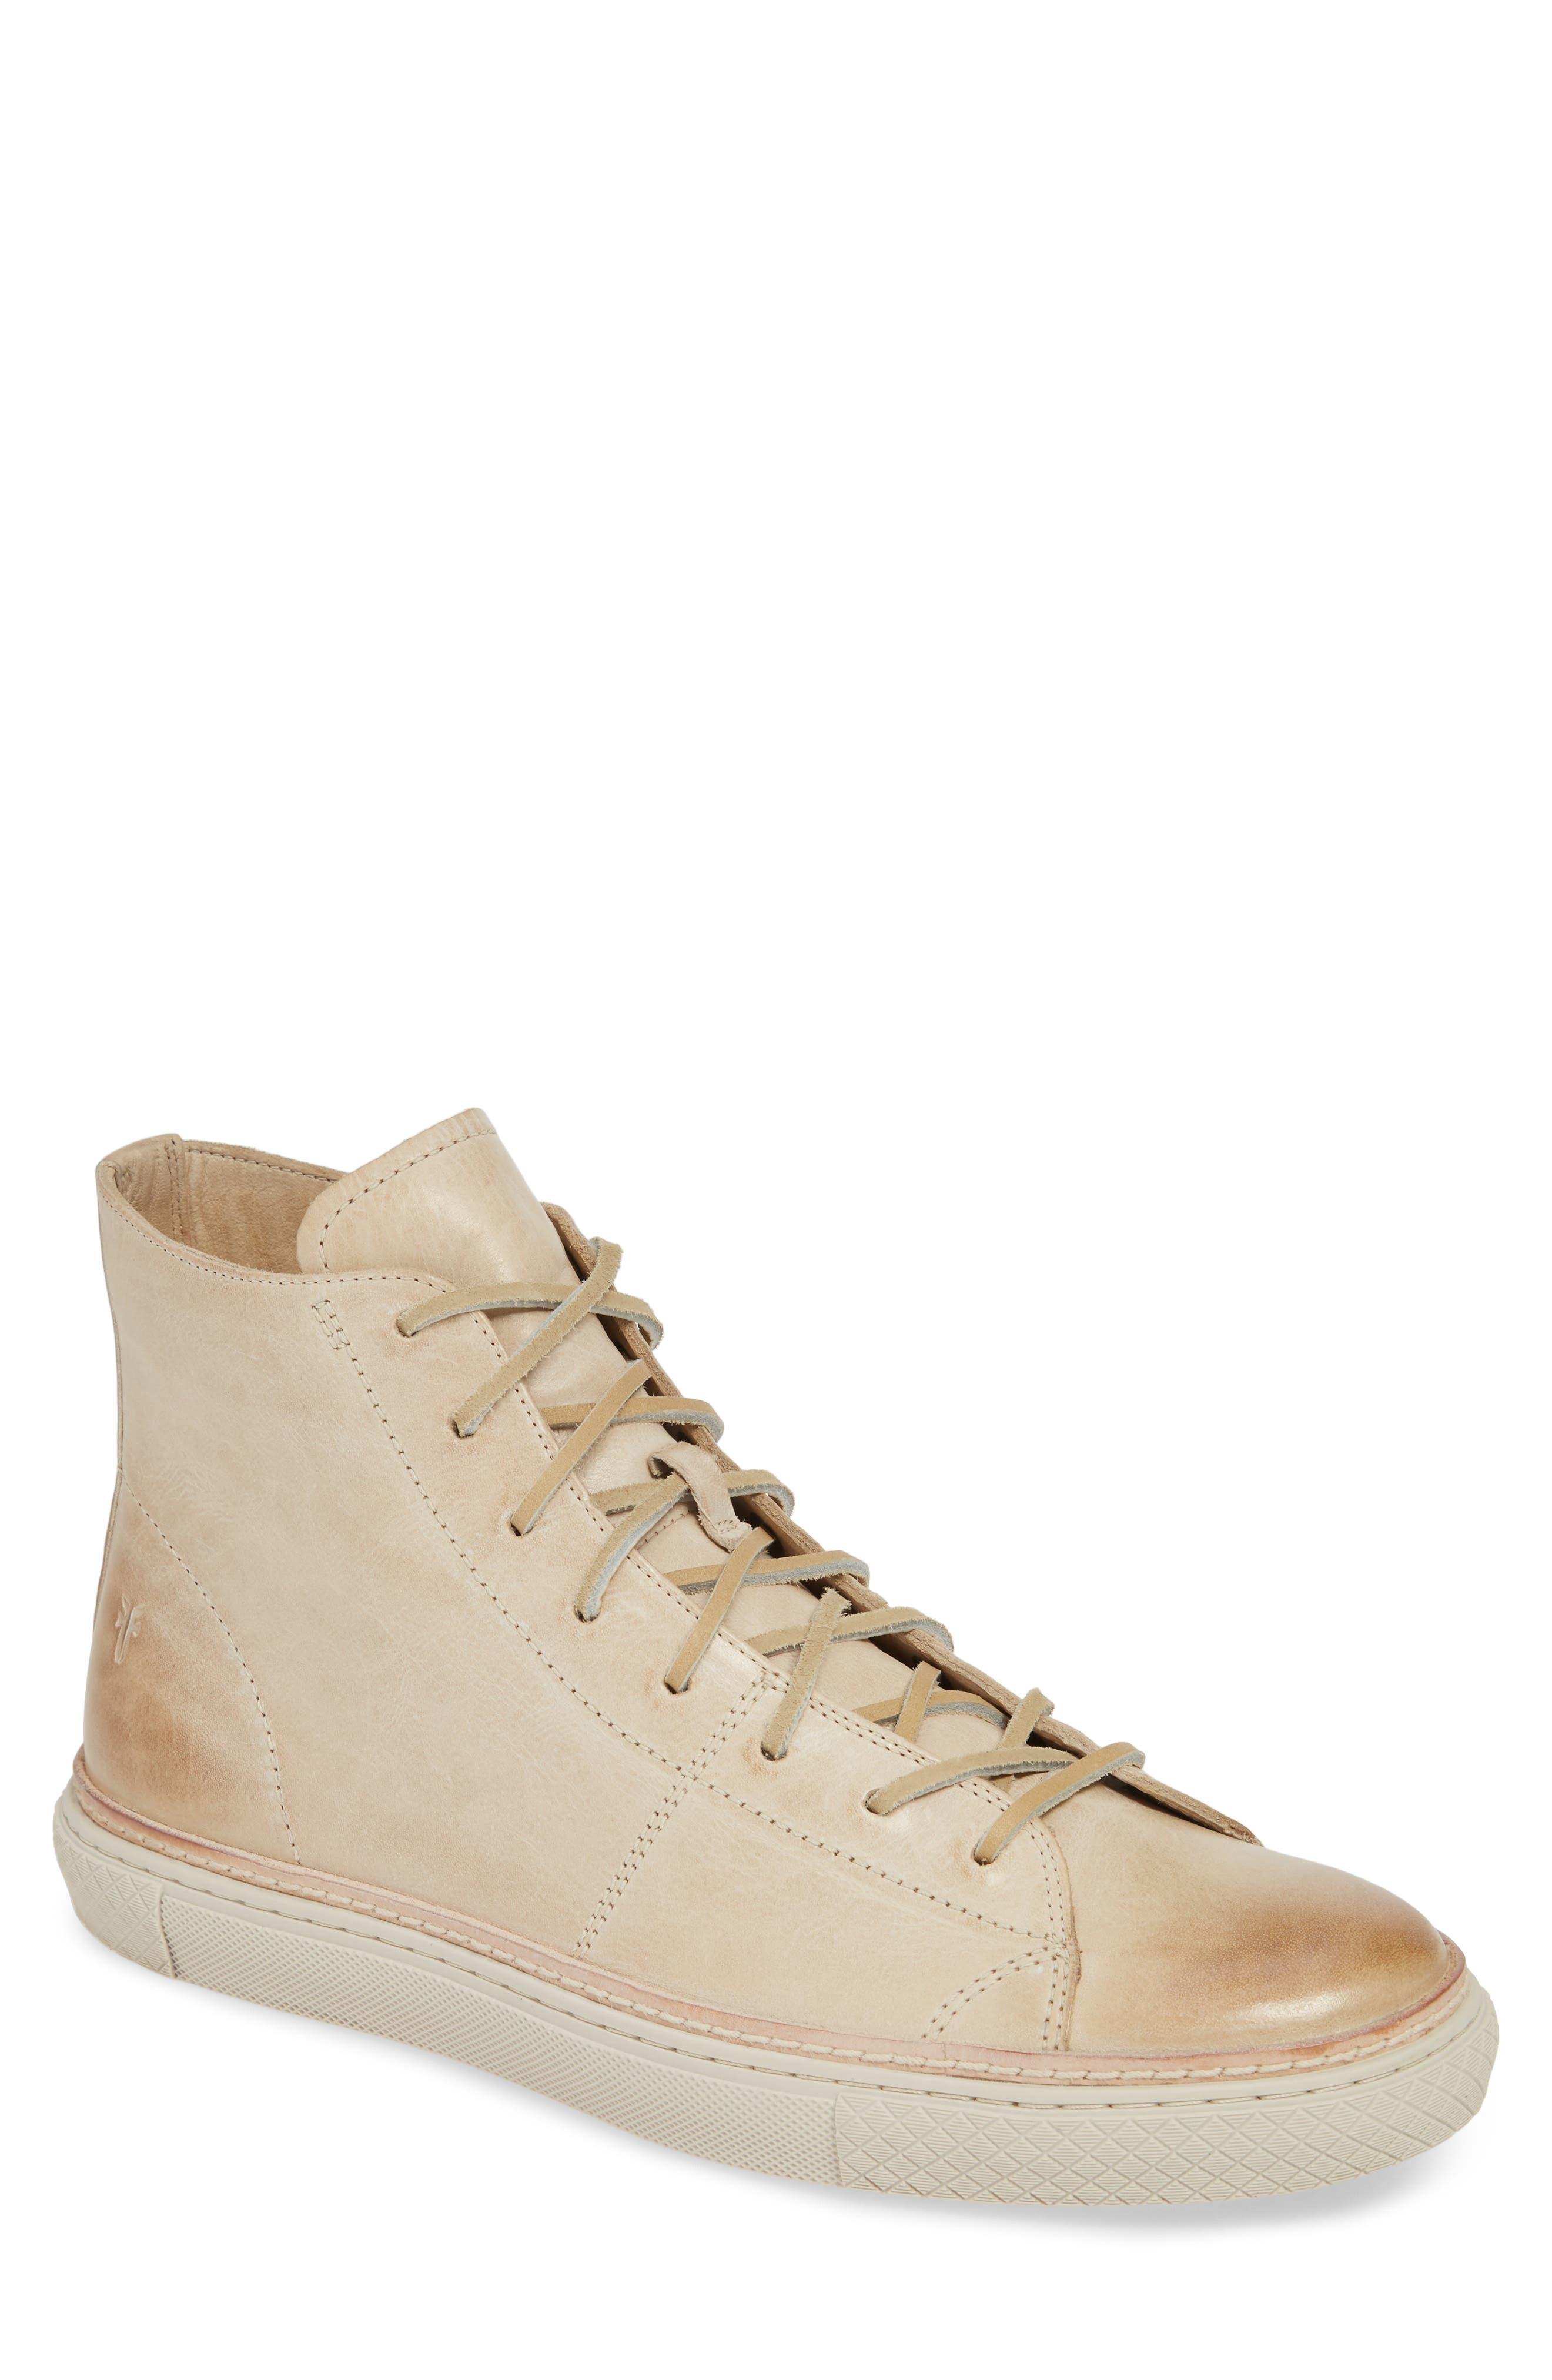 Frye Esses Sneaker- Beige